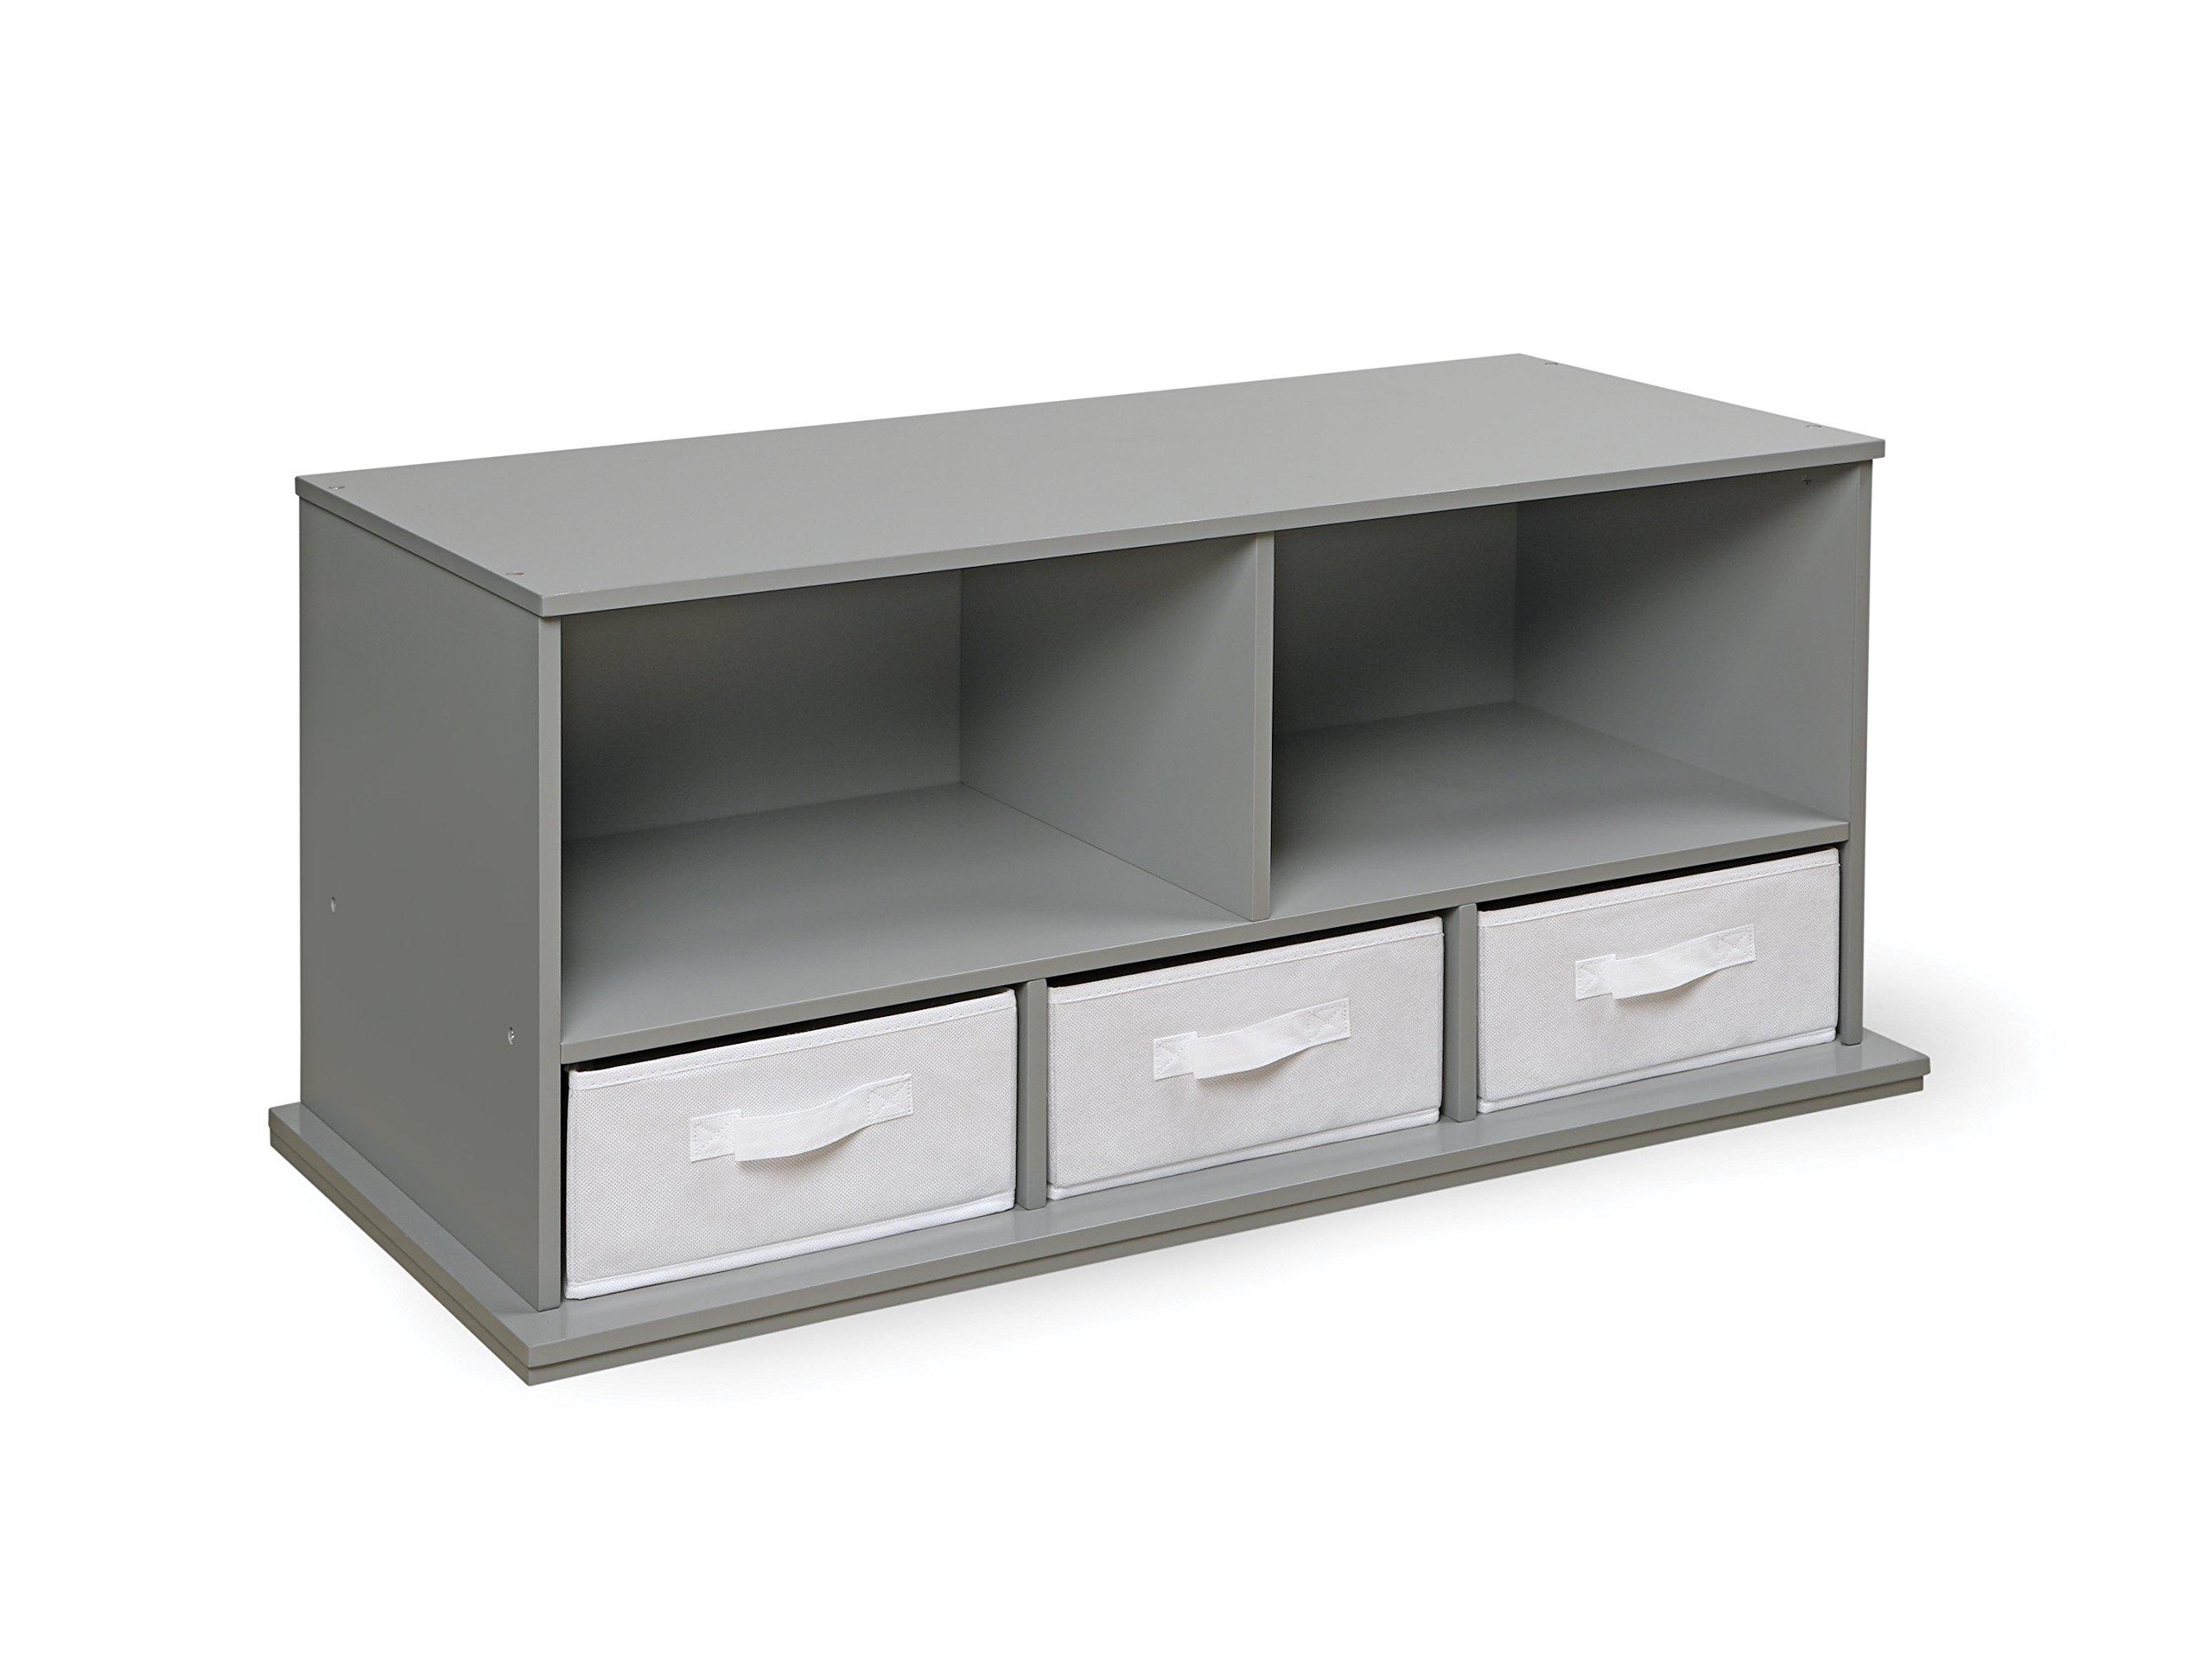 Badger Basket Shelf Storage Cubby With Three Baskets, Gray